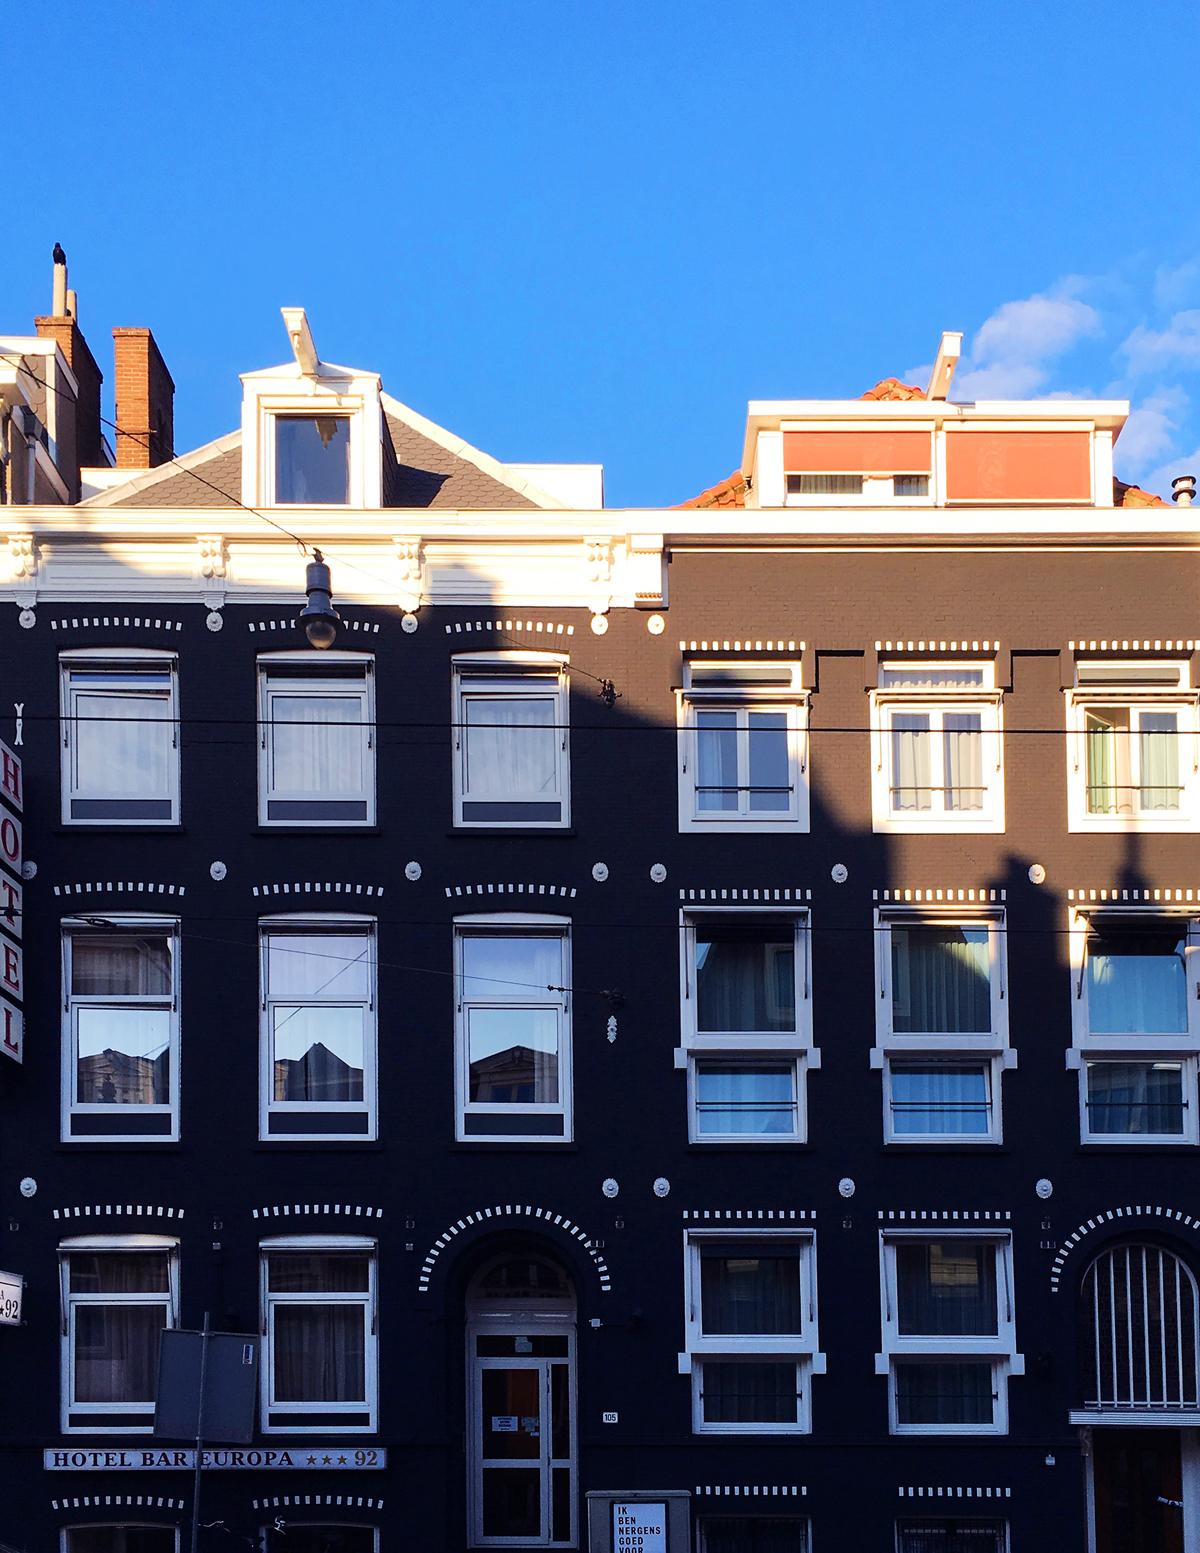 Amsterdam-hotel.jpg